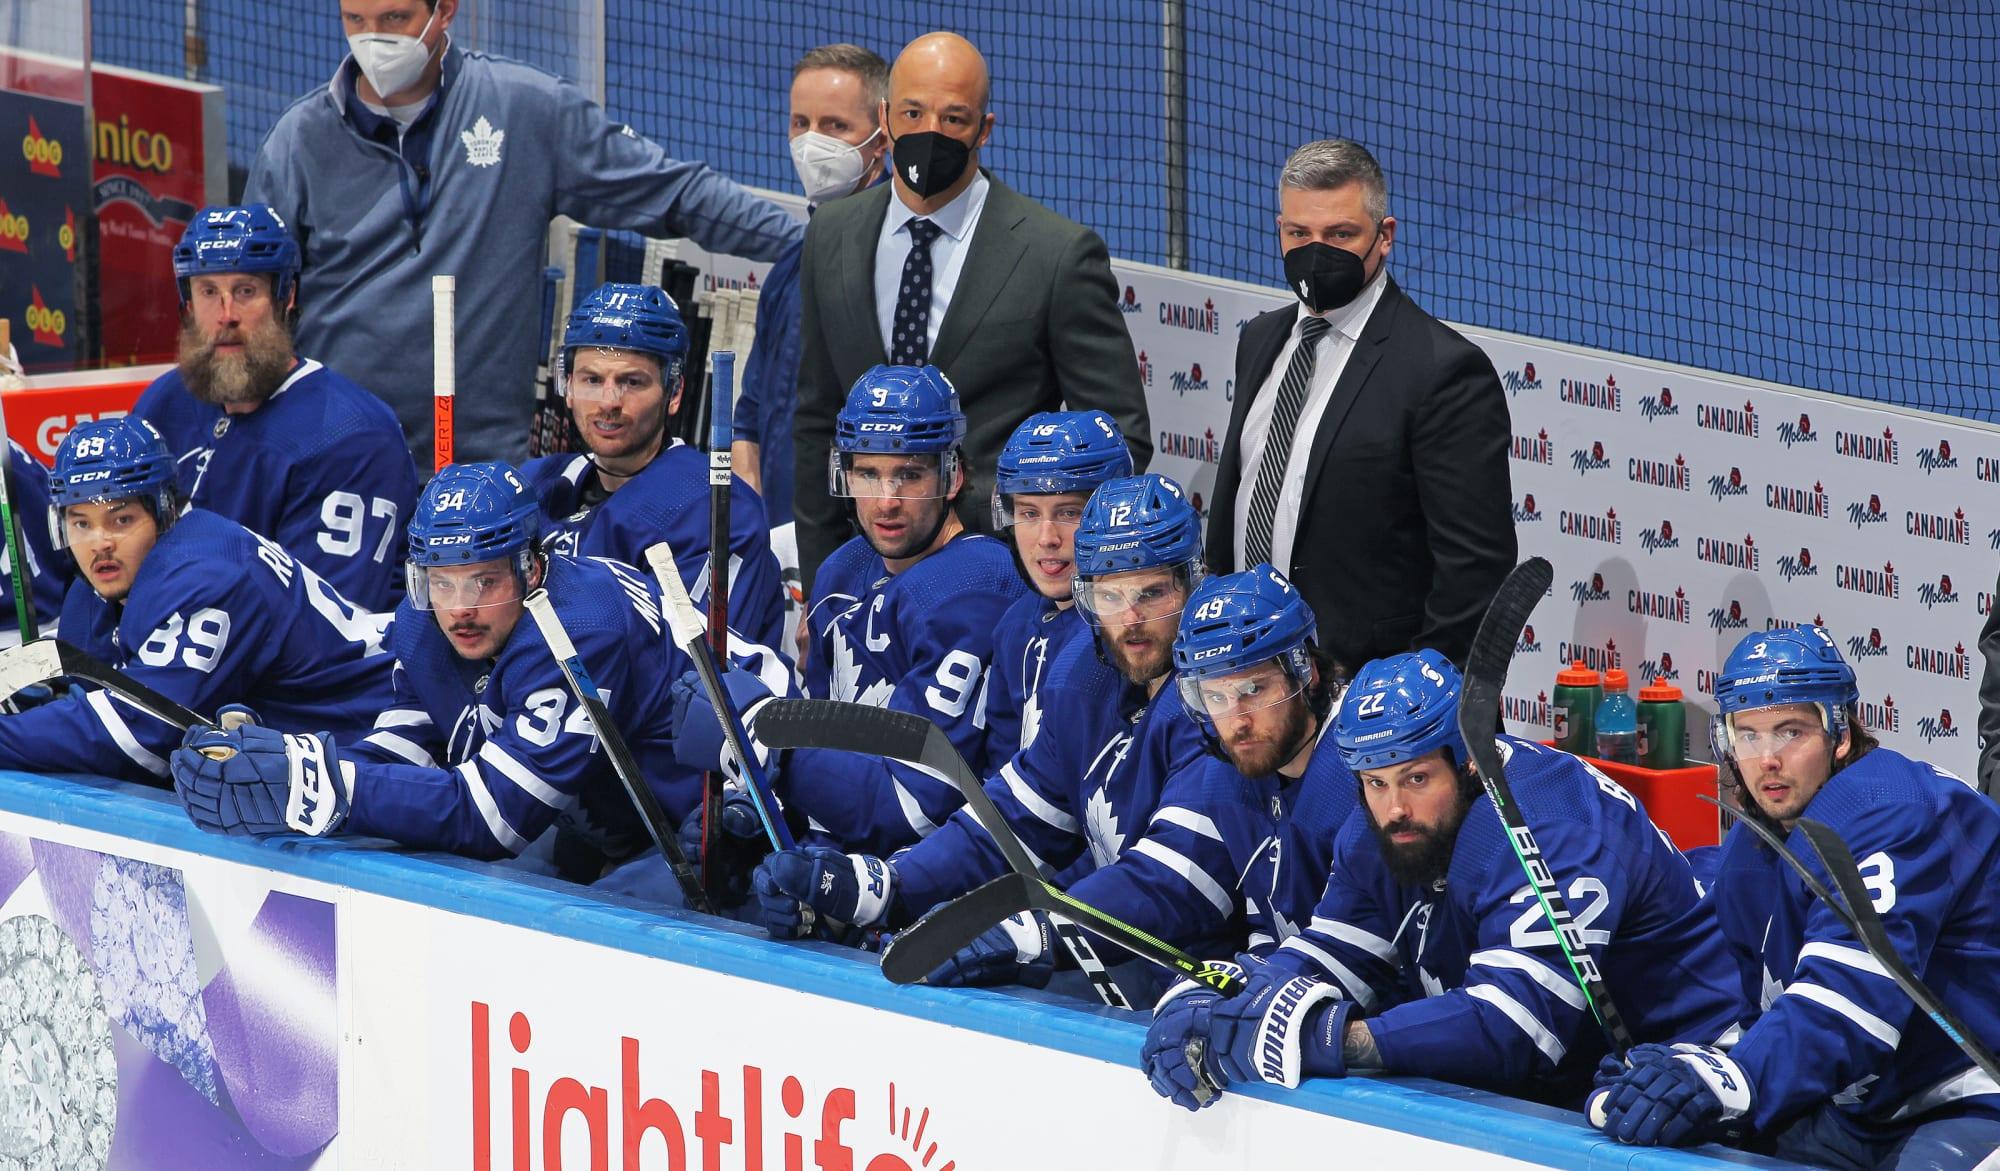 Top 5 Toronto Maple Leafs Moments of 2020-21 Season